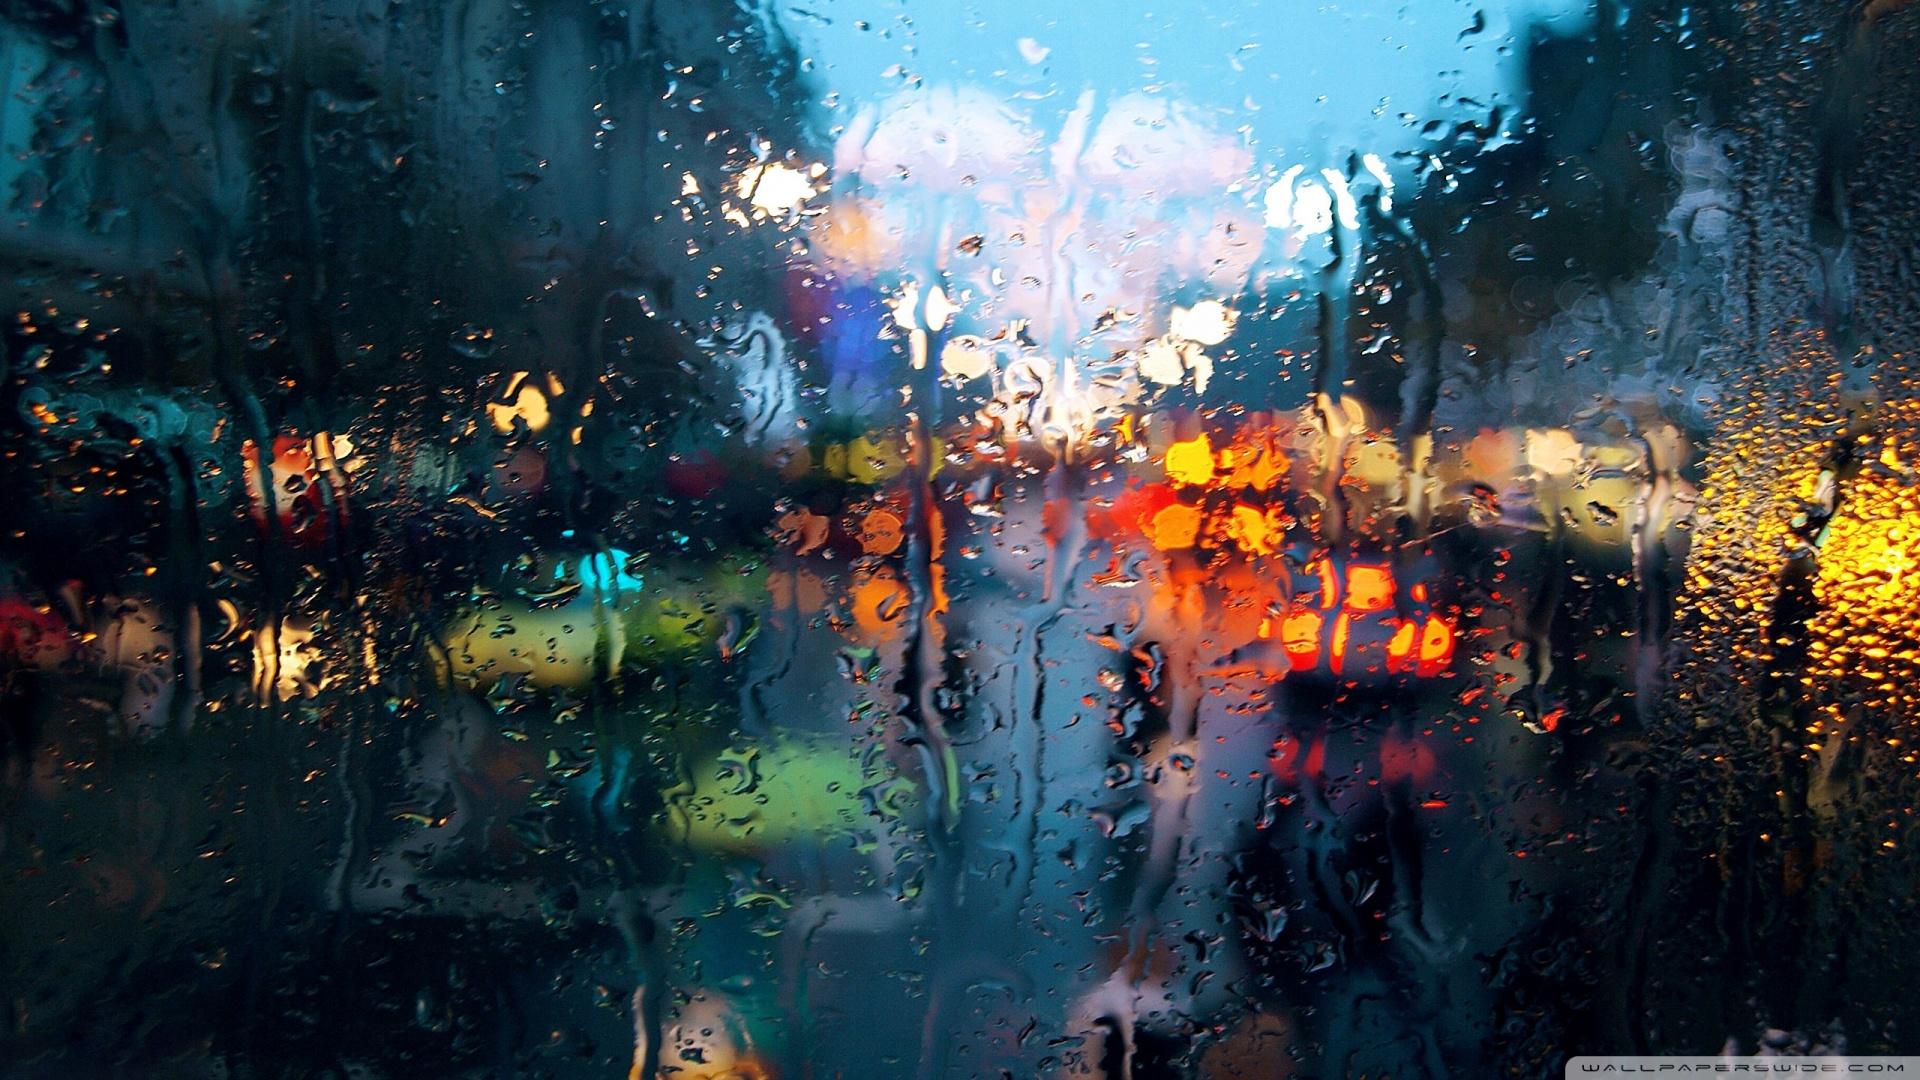 Rainy Weather Wallpaper 1920x1080 Rainy Weather 1920x1080